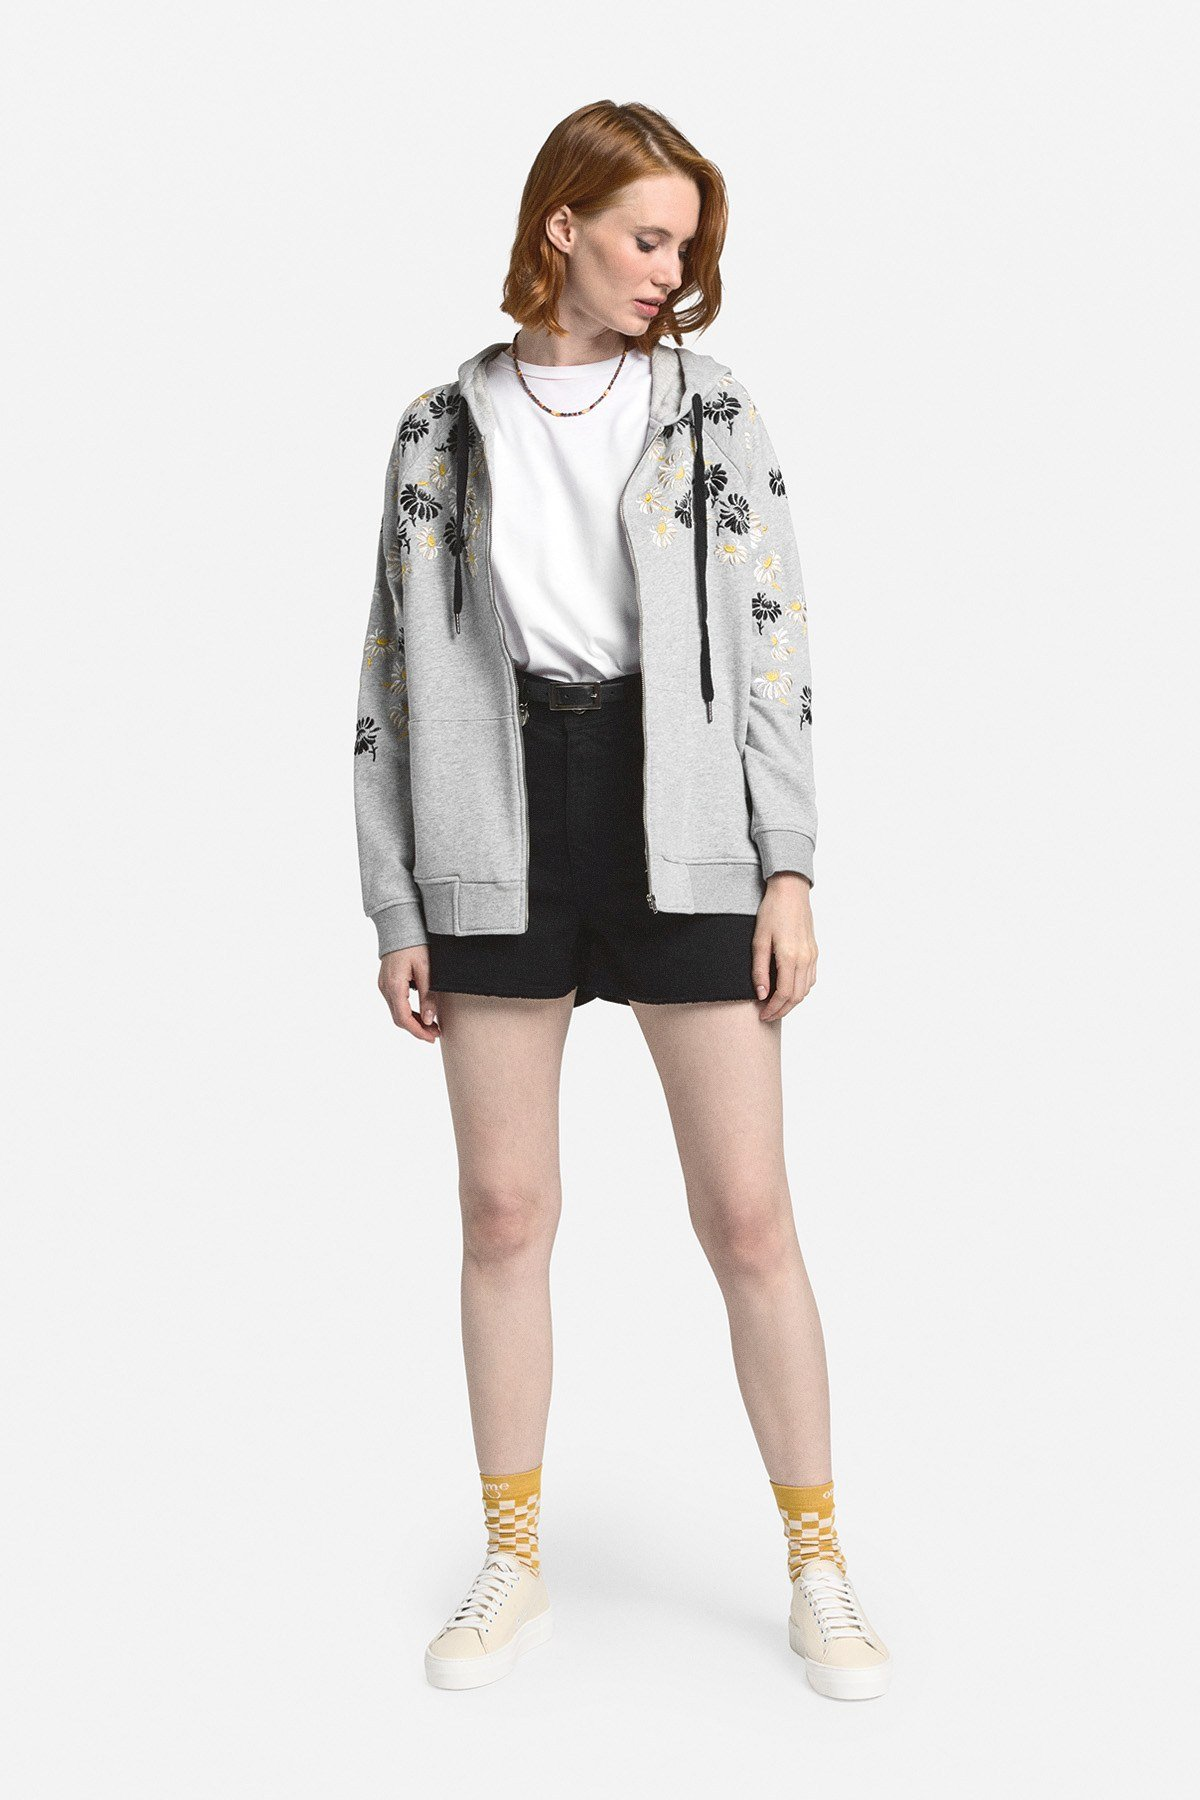 Cotton sweatshirt with zipper